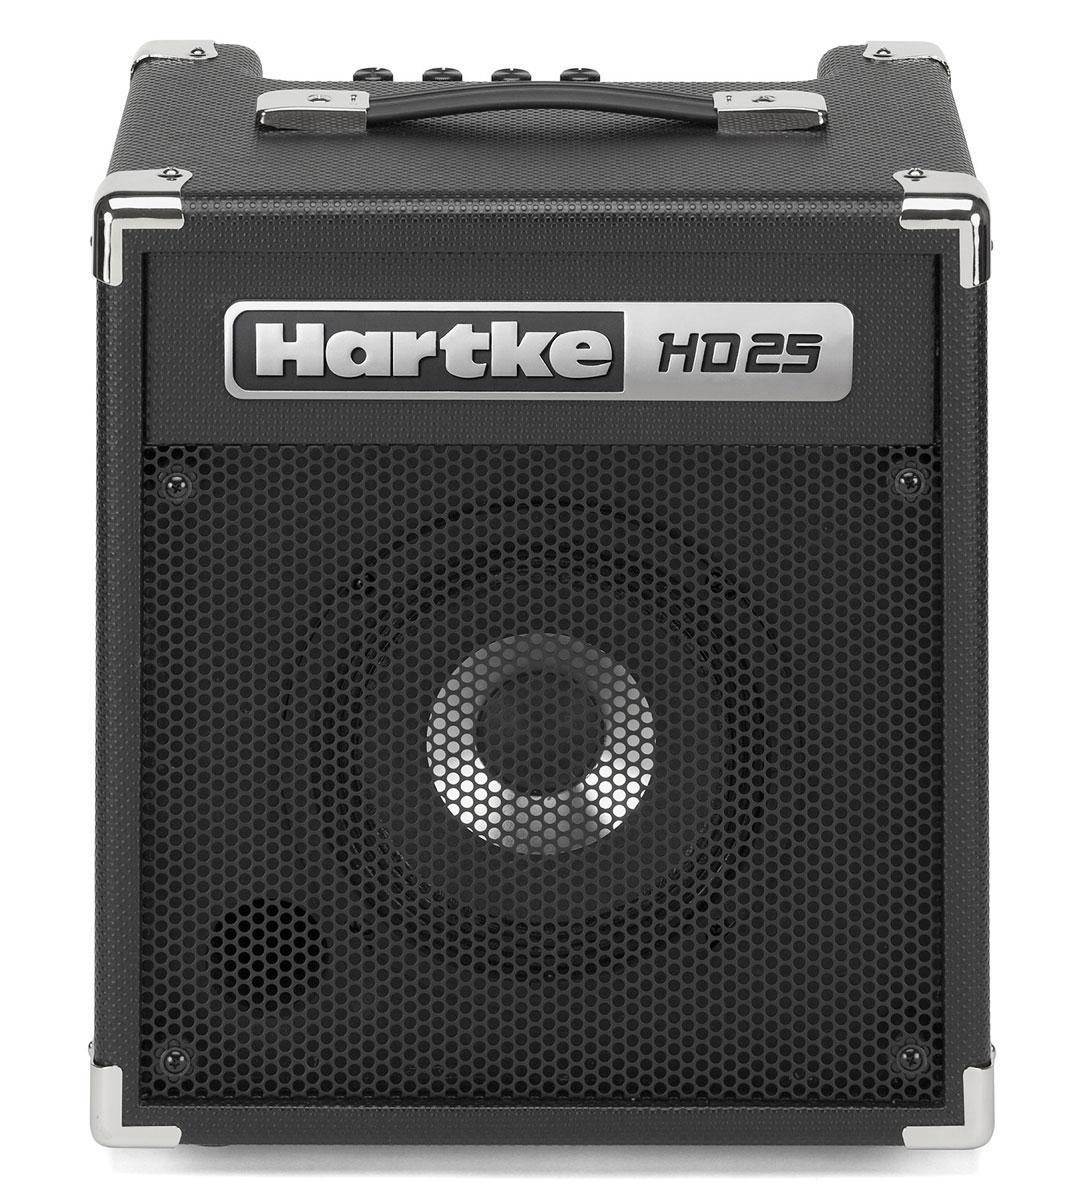 Hartke Hd25 - Combo Basse 1x8 - 25w